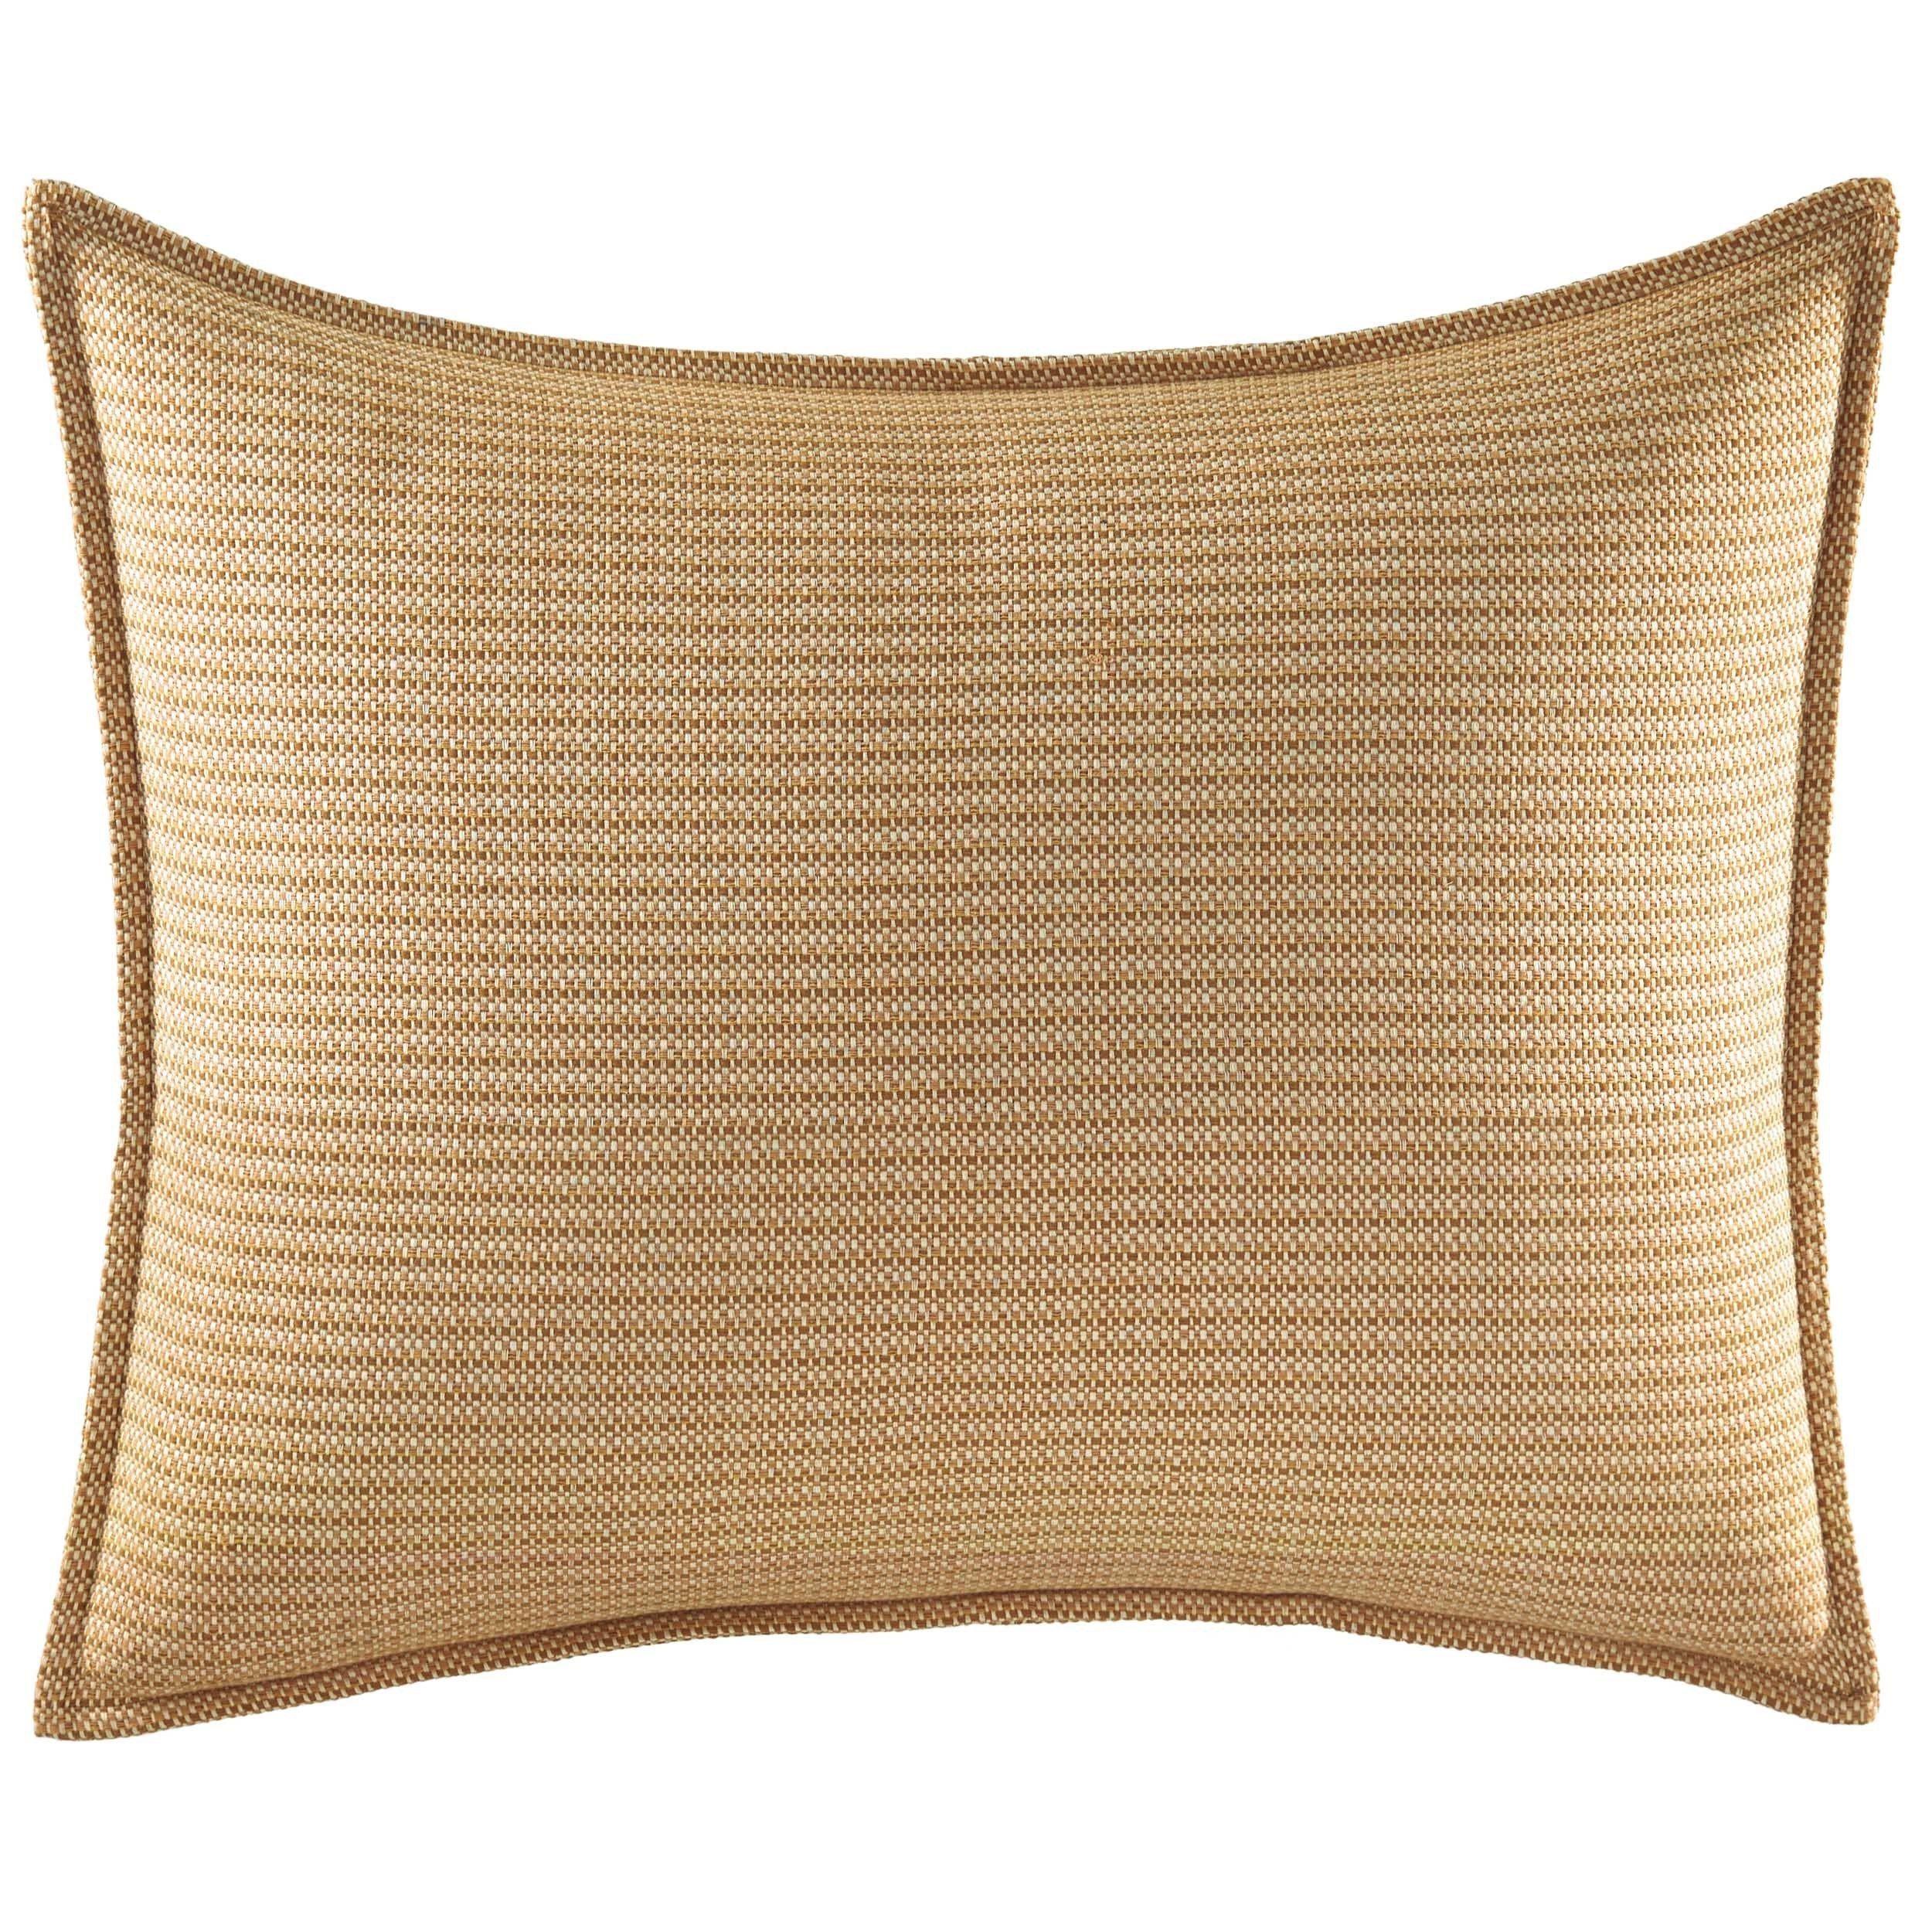 Tommy Bahama Cayo Coco Textured Breakfast Pillow (Cayo Coco ...